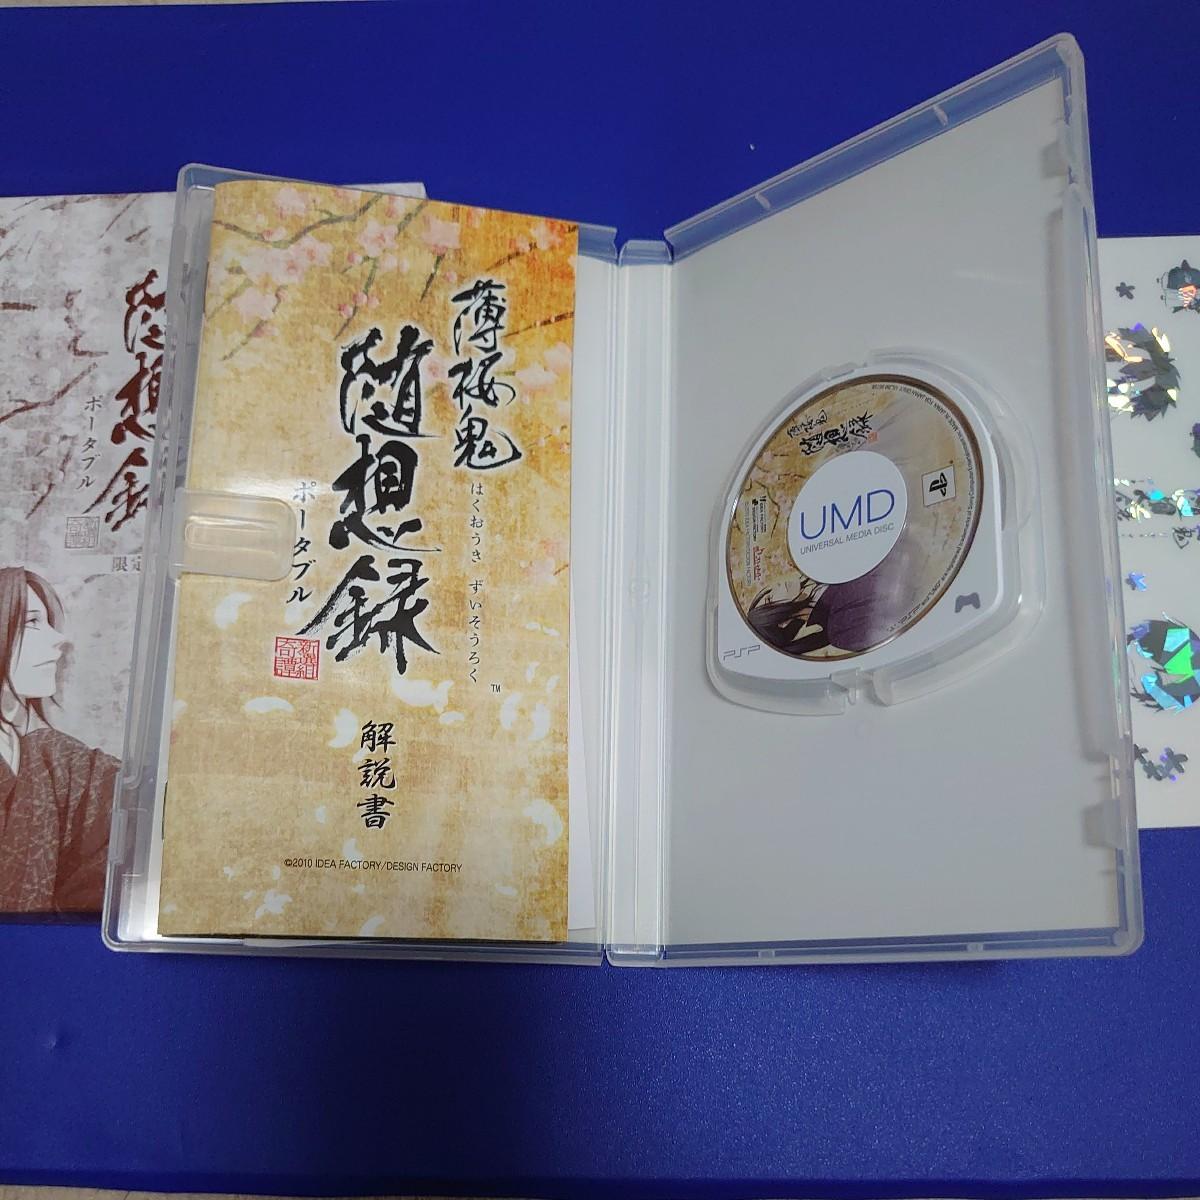 【PSP】 薄桜鬼 随想録 ポータブル (限定版)プレイステーションポータブル